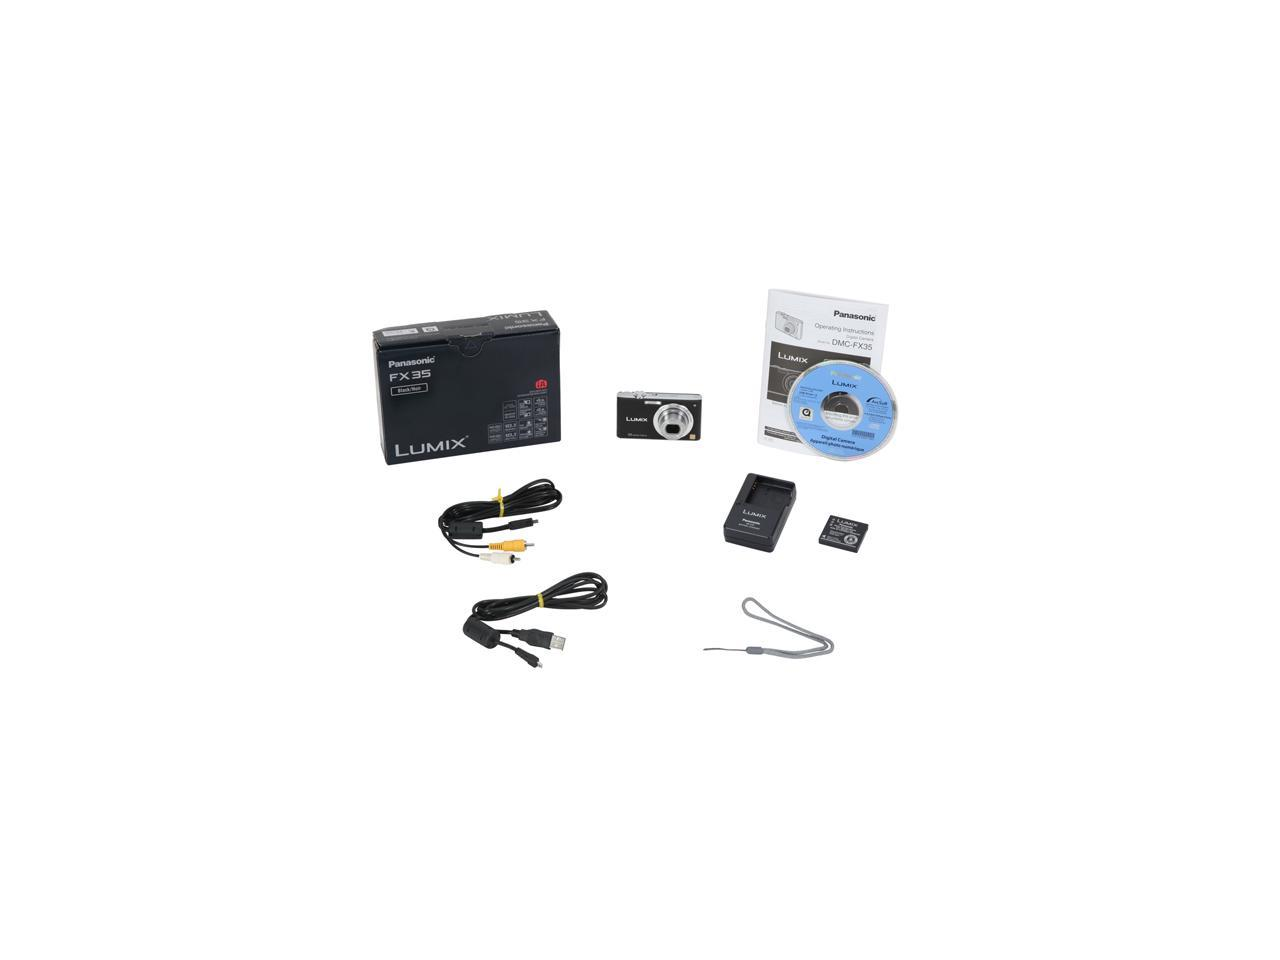 Panasonic Lumix DMC-FX35K Black 10.1 MP 25mm Wide Angle